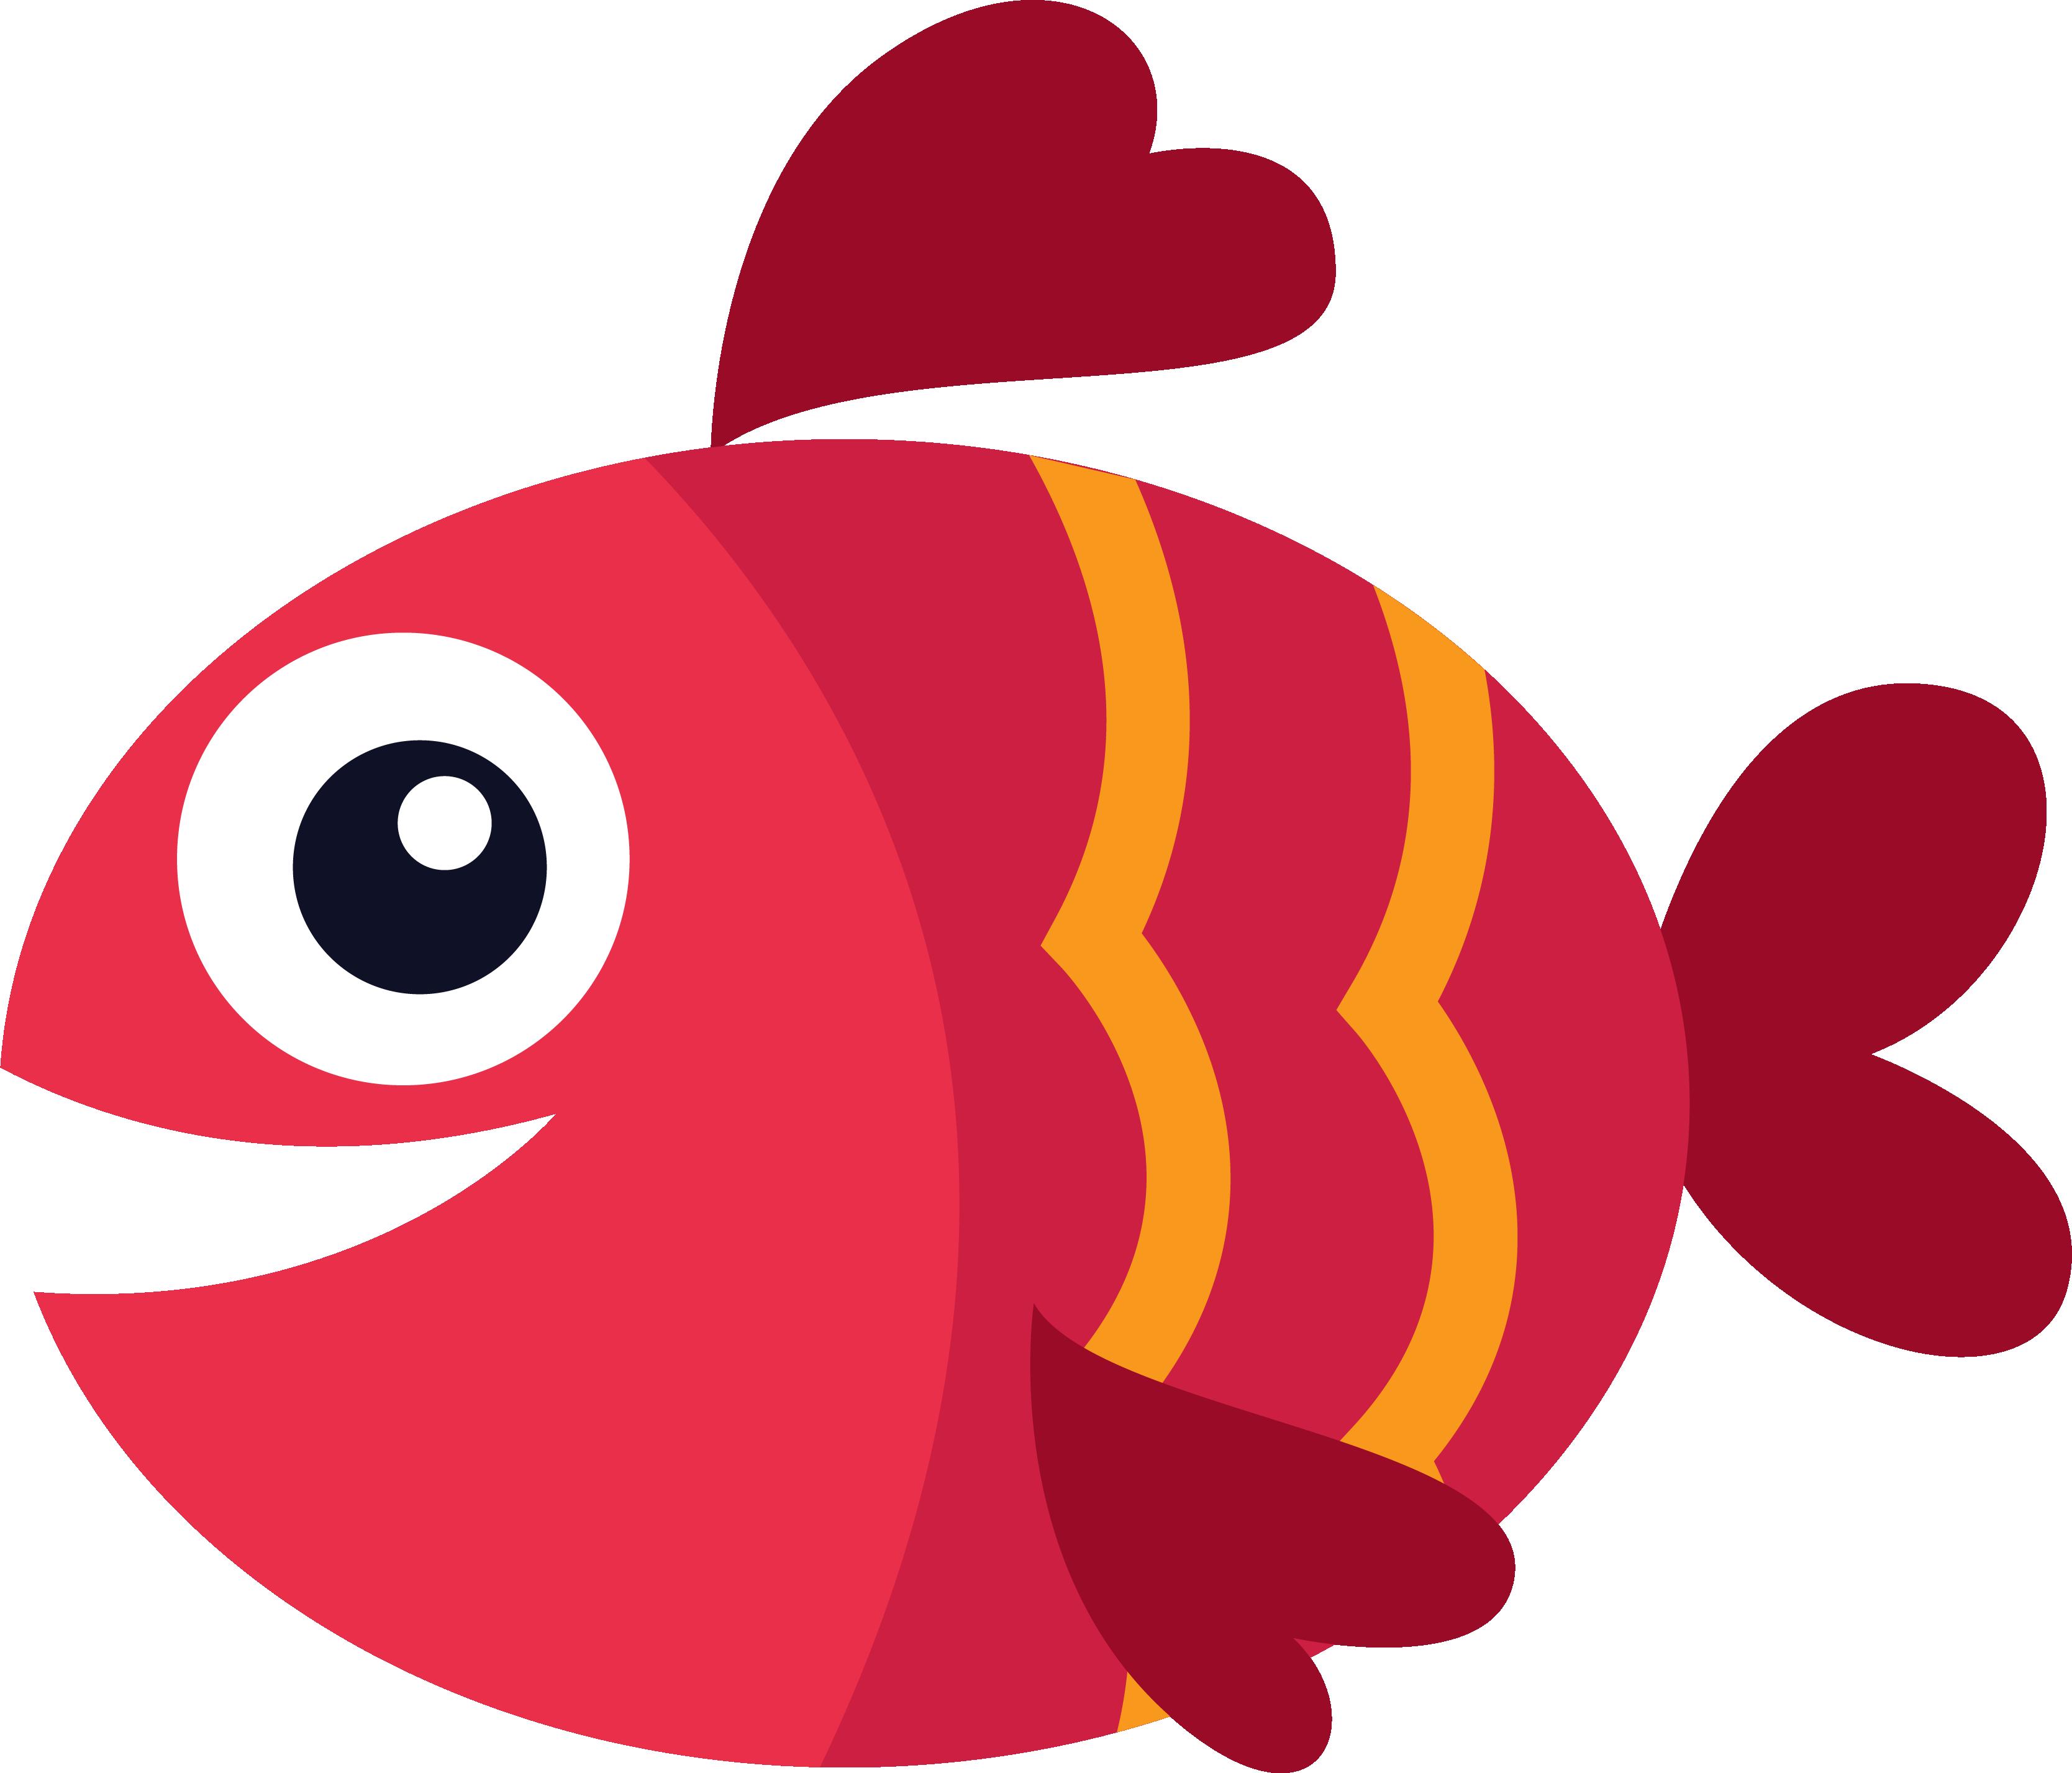 3336x2854 Excellent Clip Art Fish Png Images Transparent Pictures Only